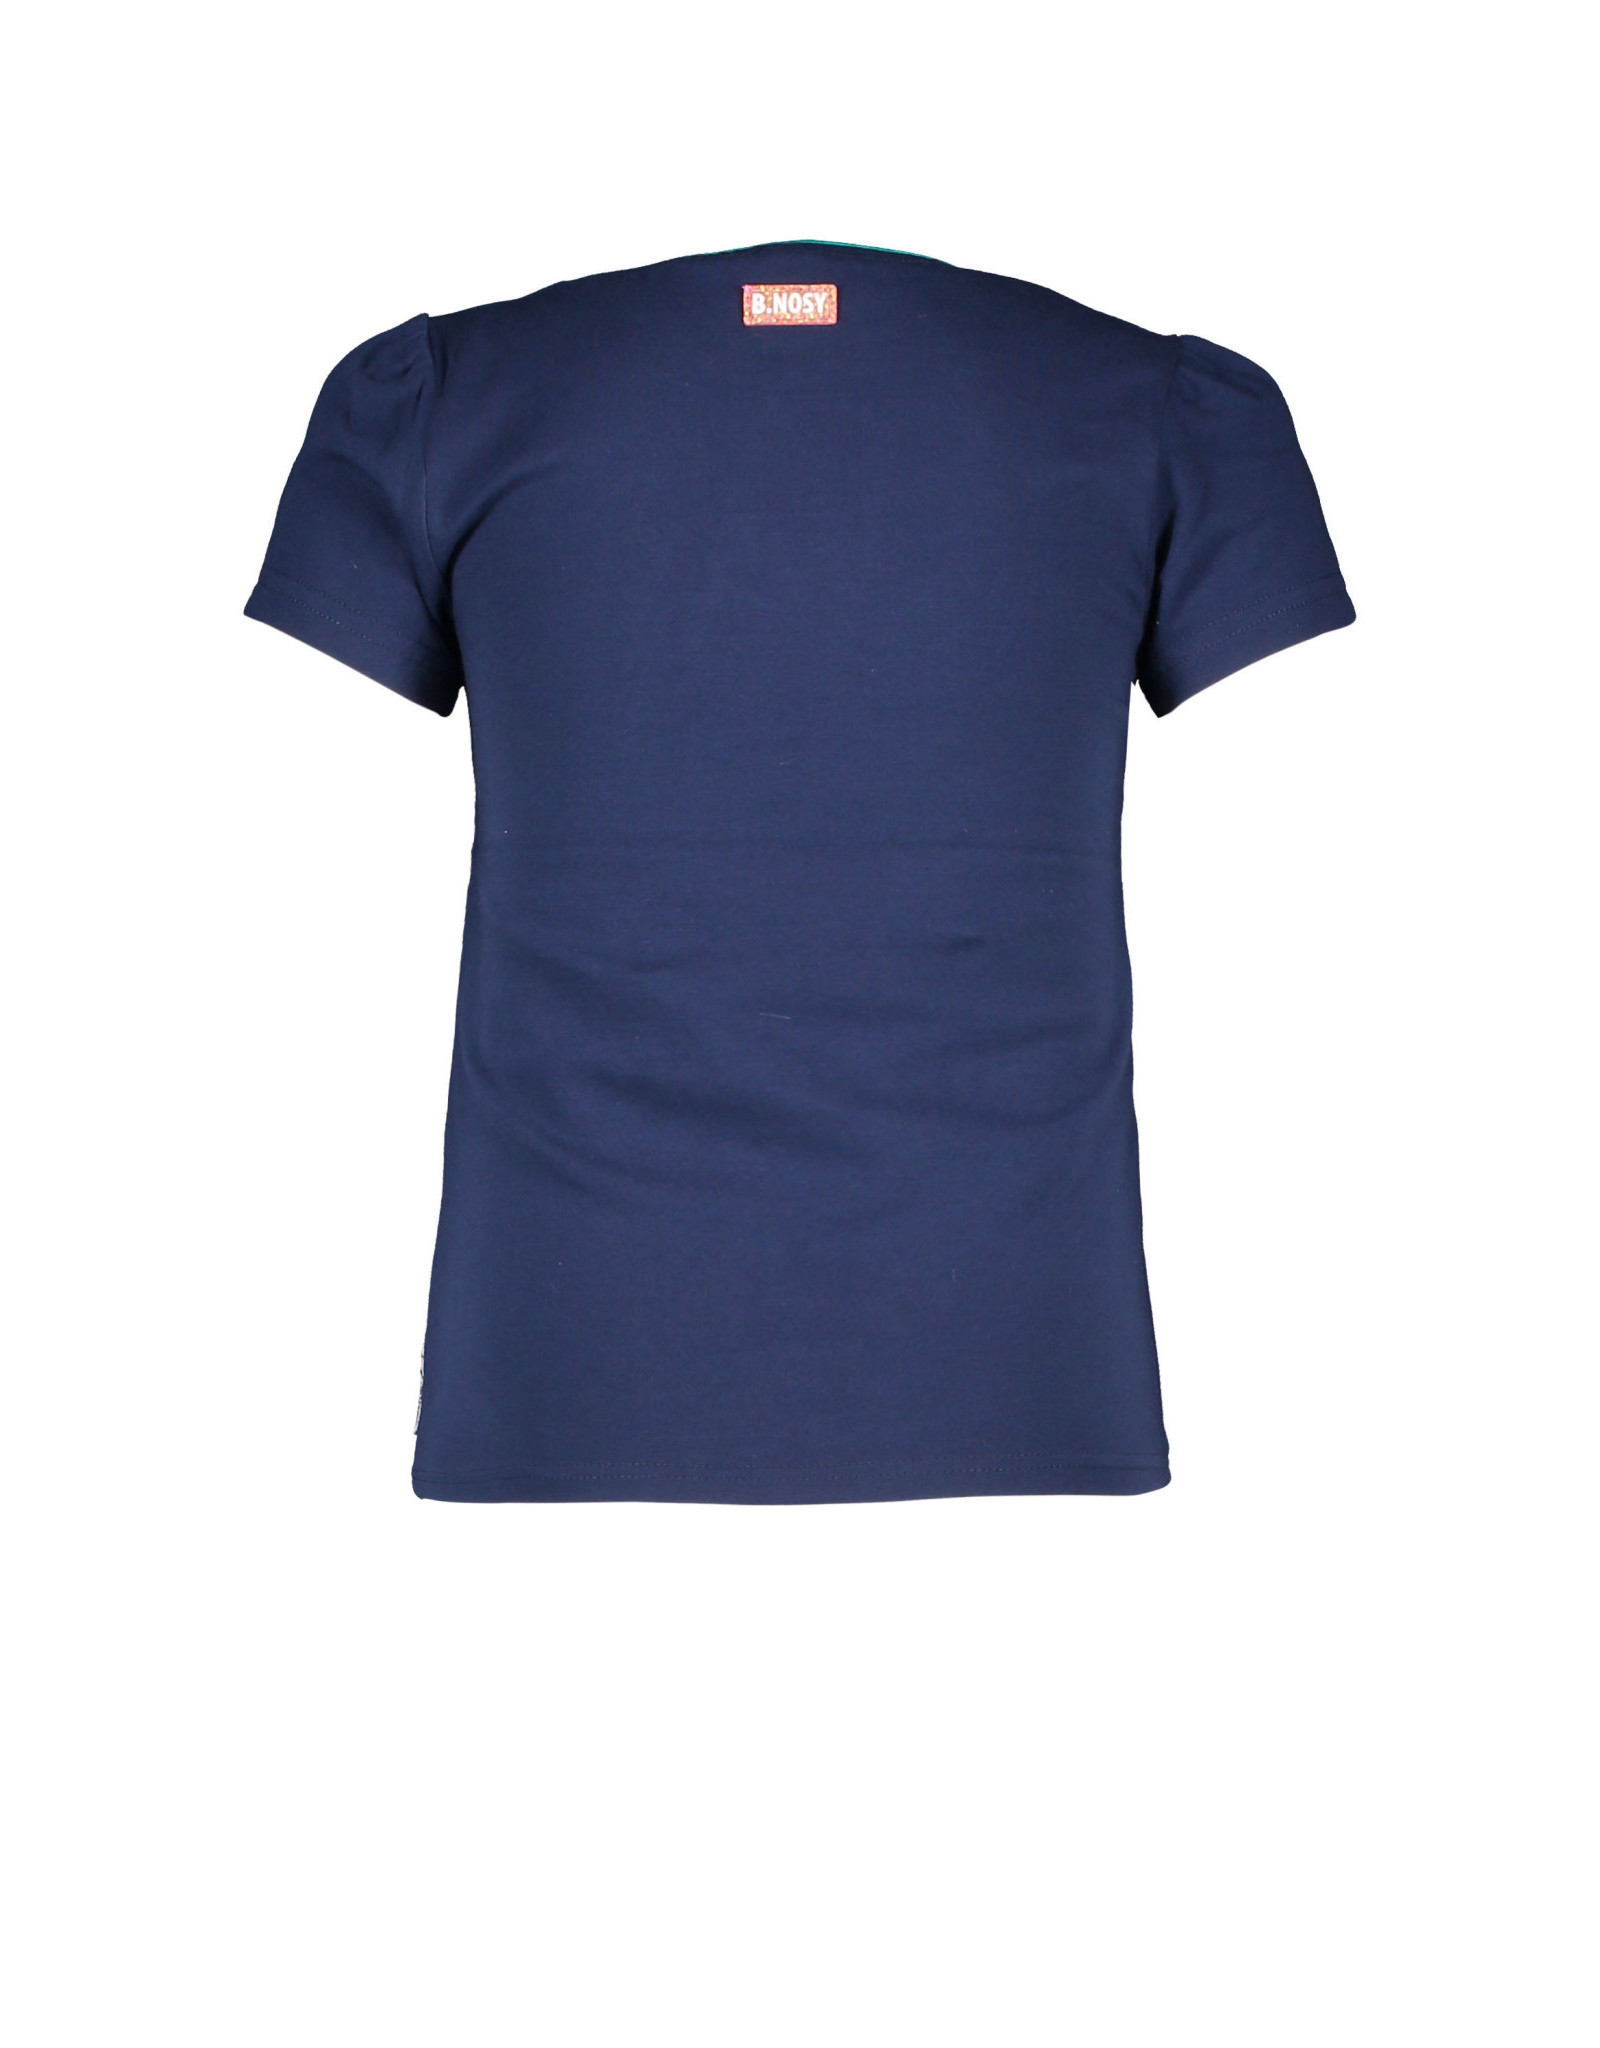 B.Nosy B.Nosy meisjes t-shirt Tropical Vibes Space Blue